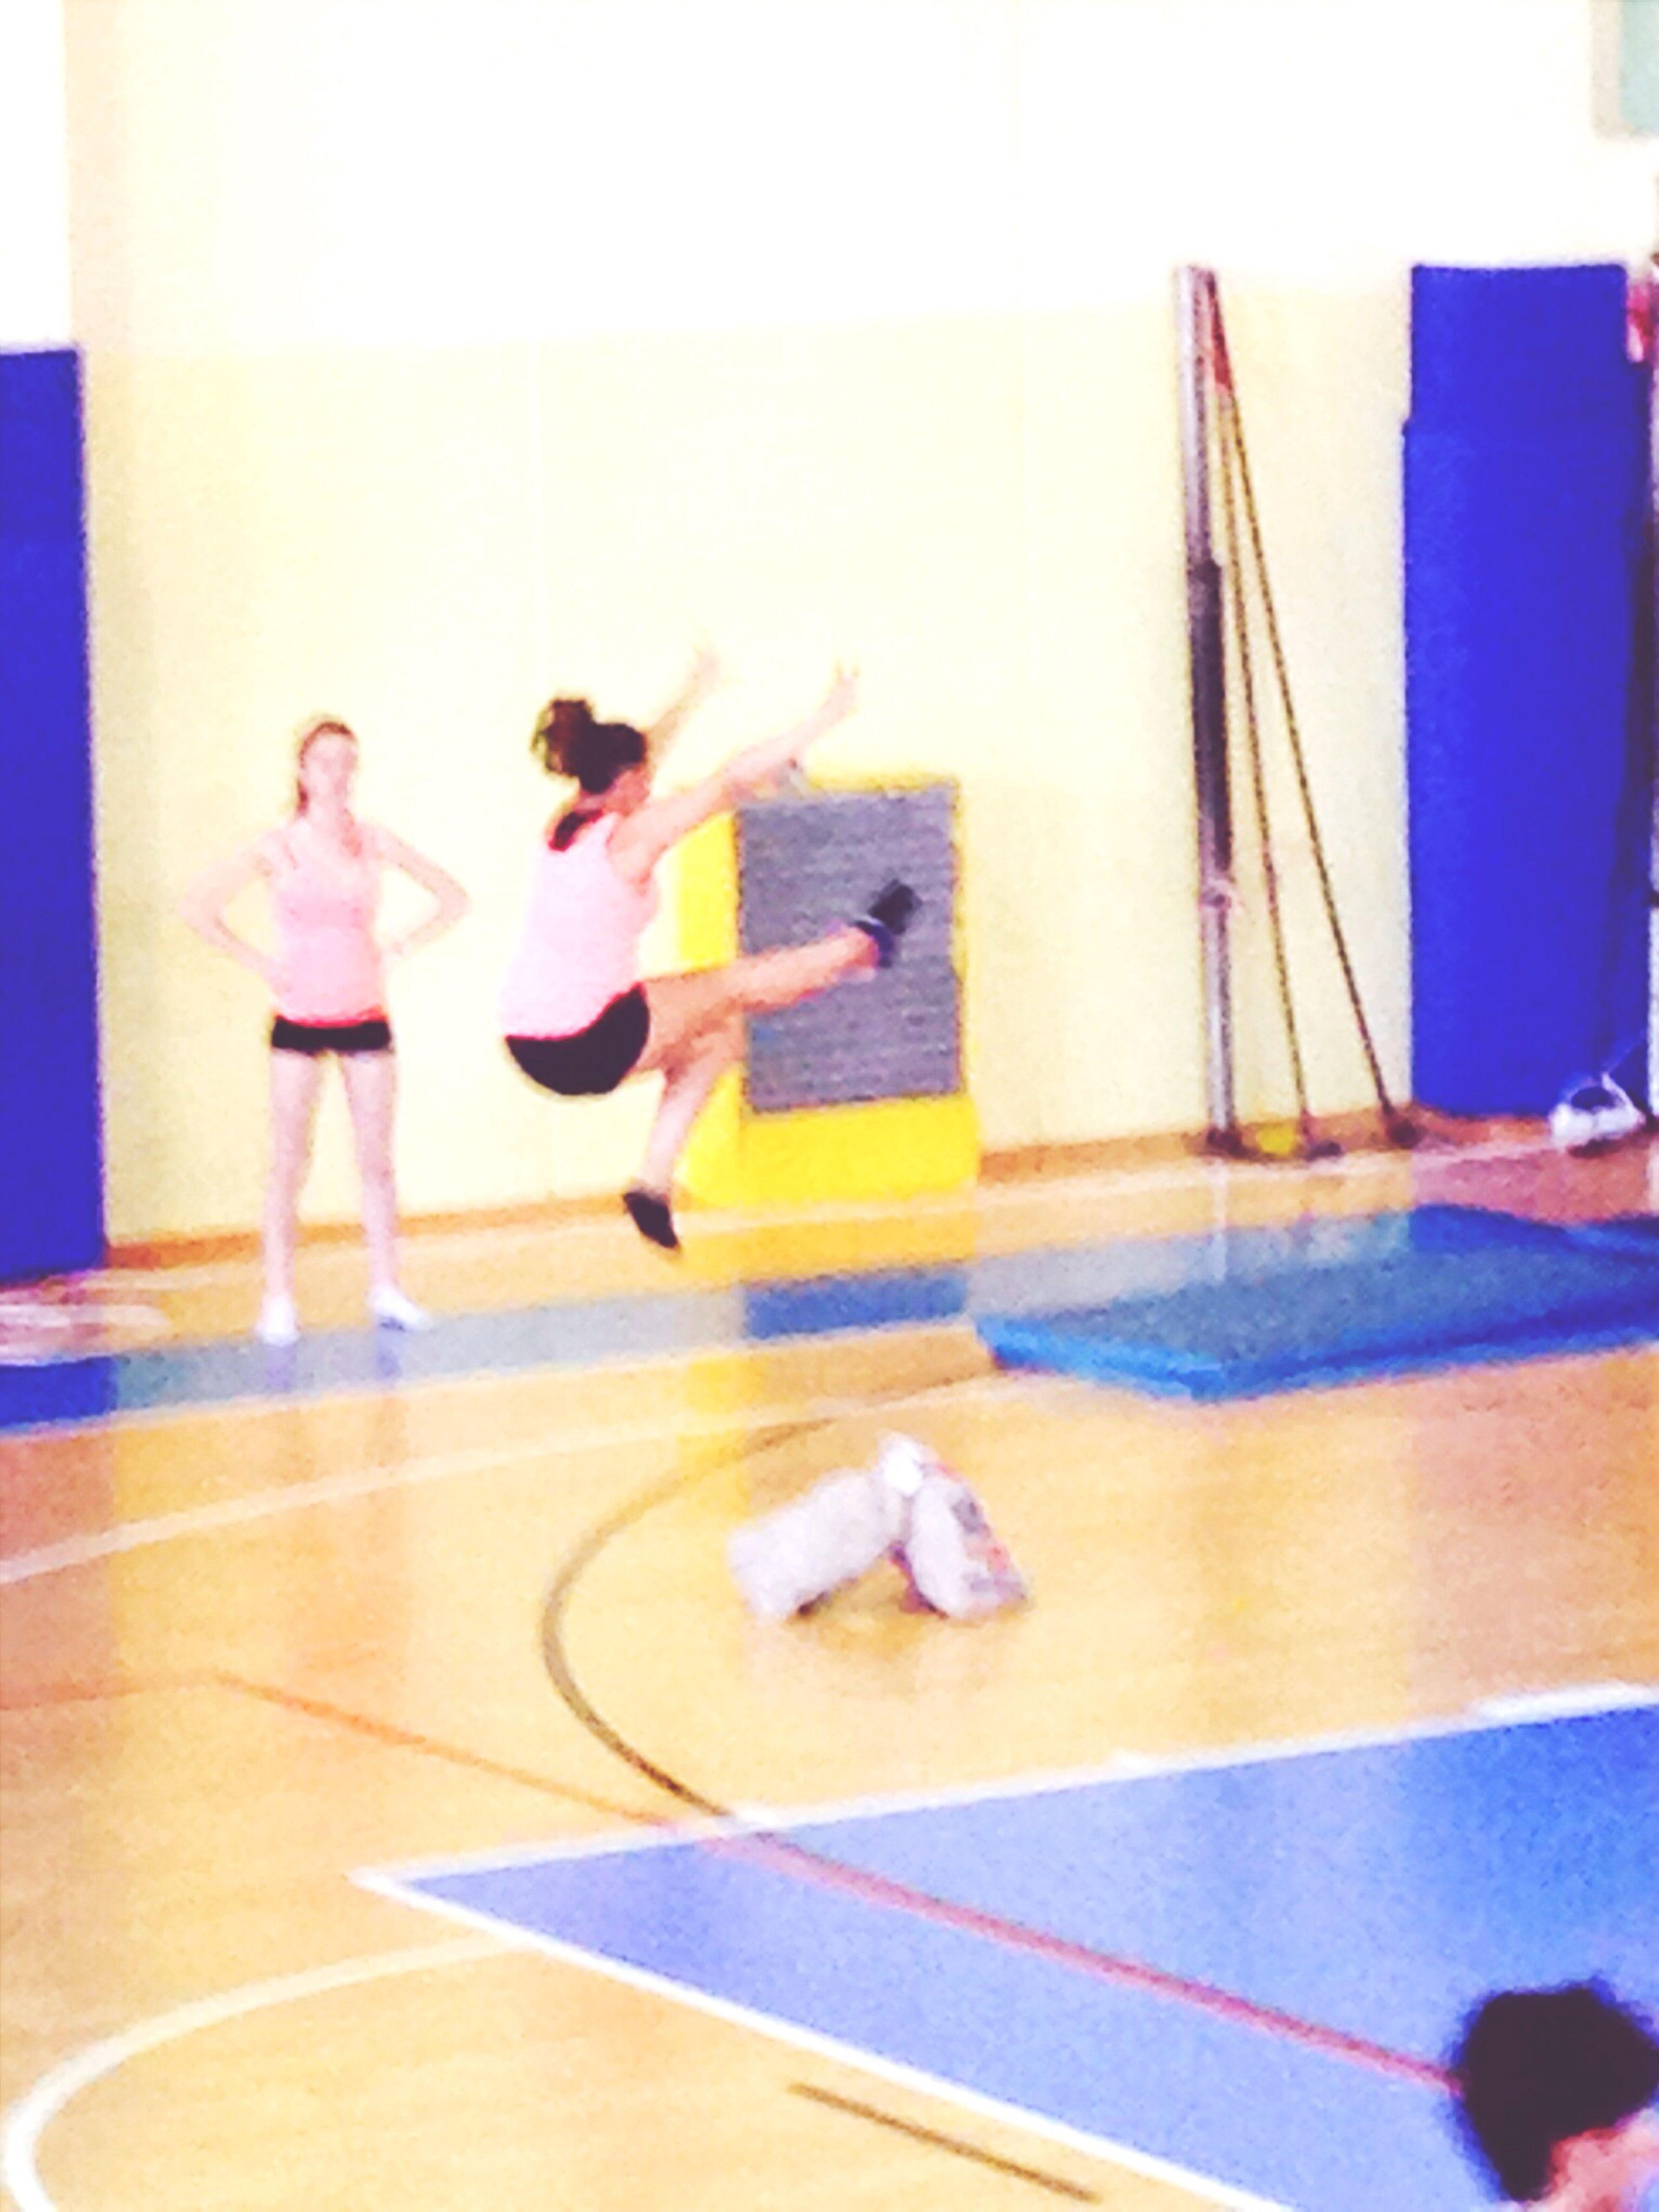 Me Gym Artistic Gymnastics Esibizione A Scuola ❤️❤️